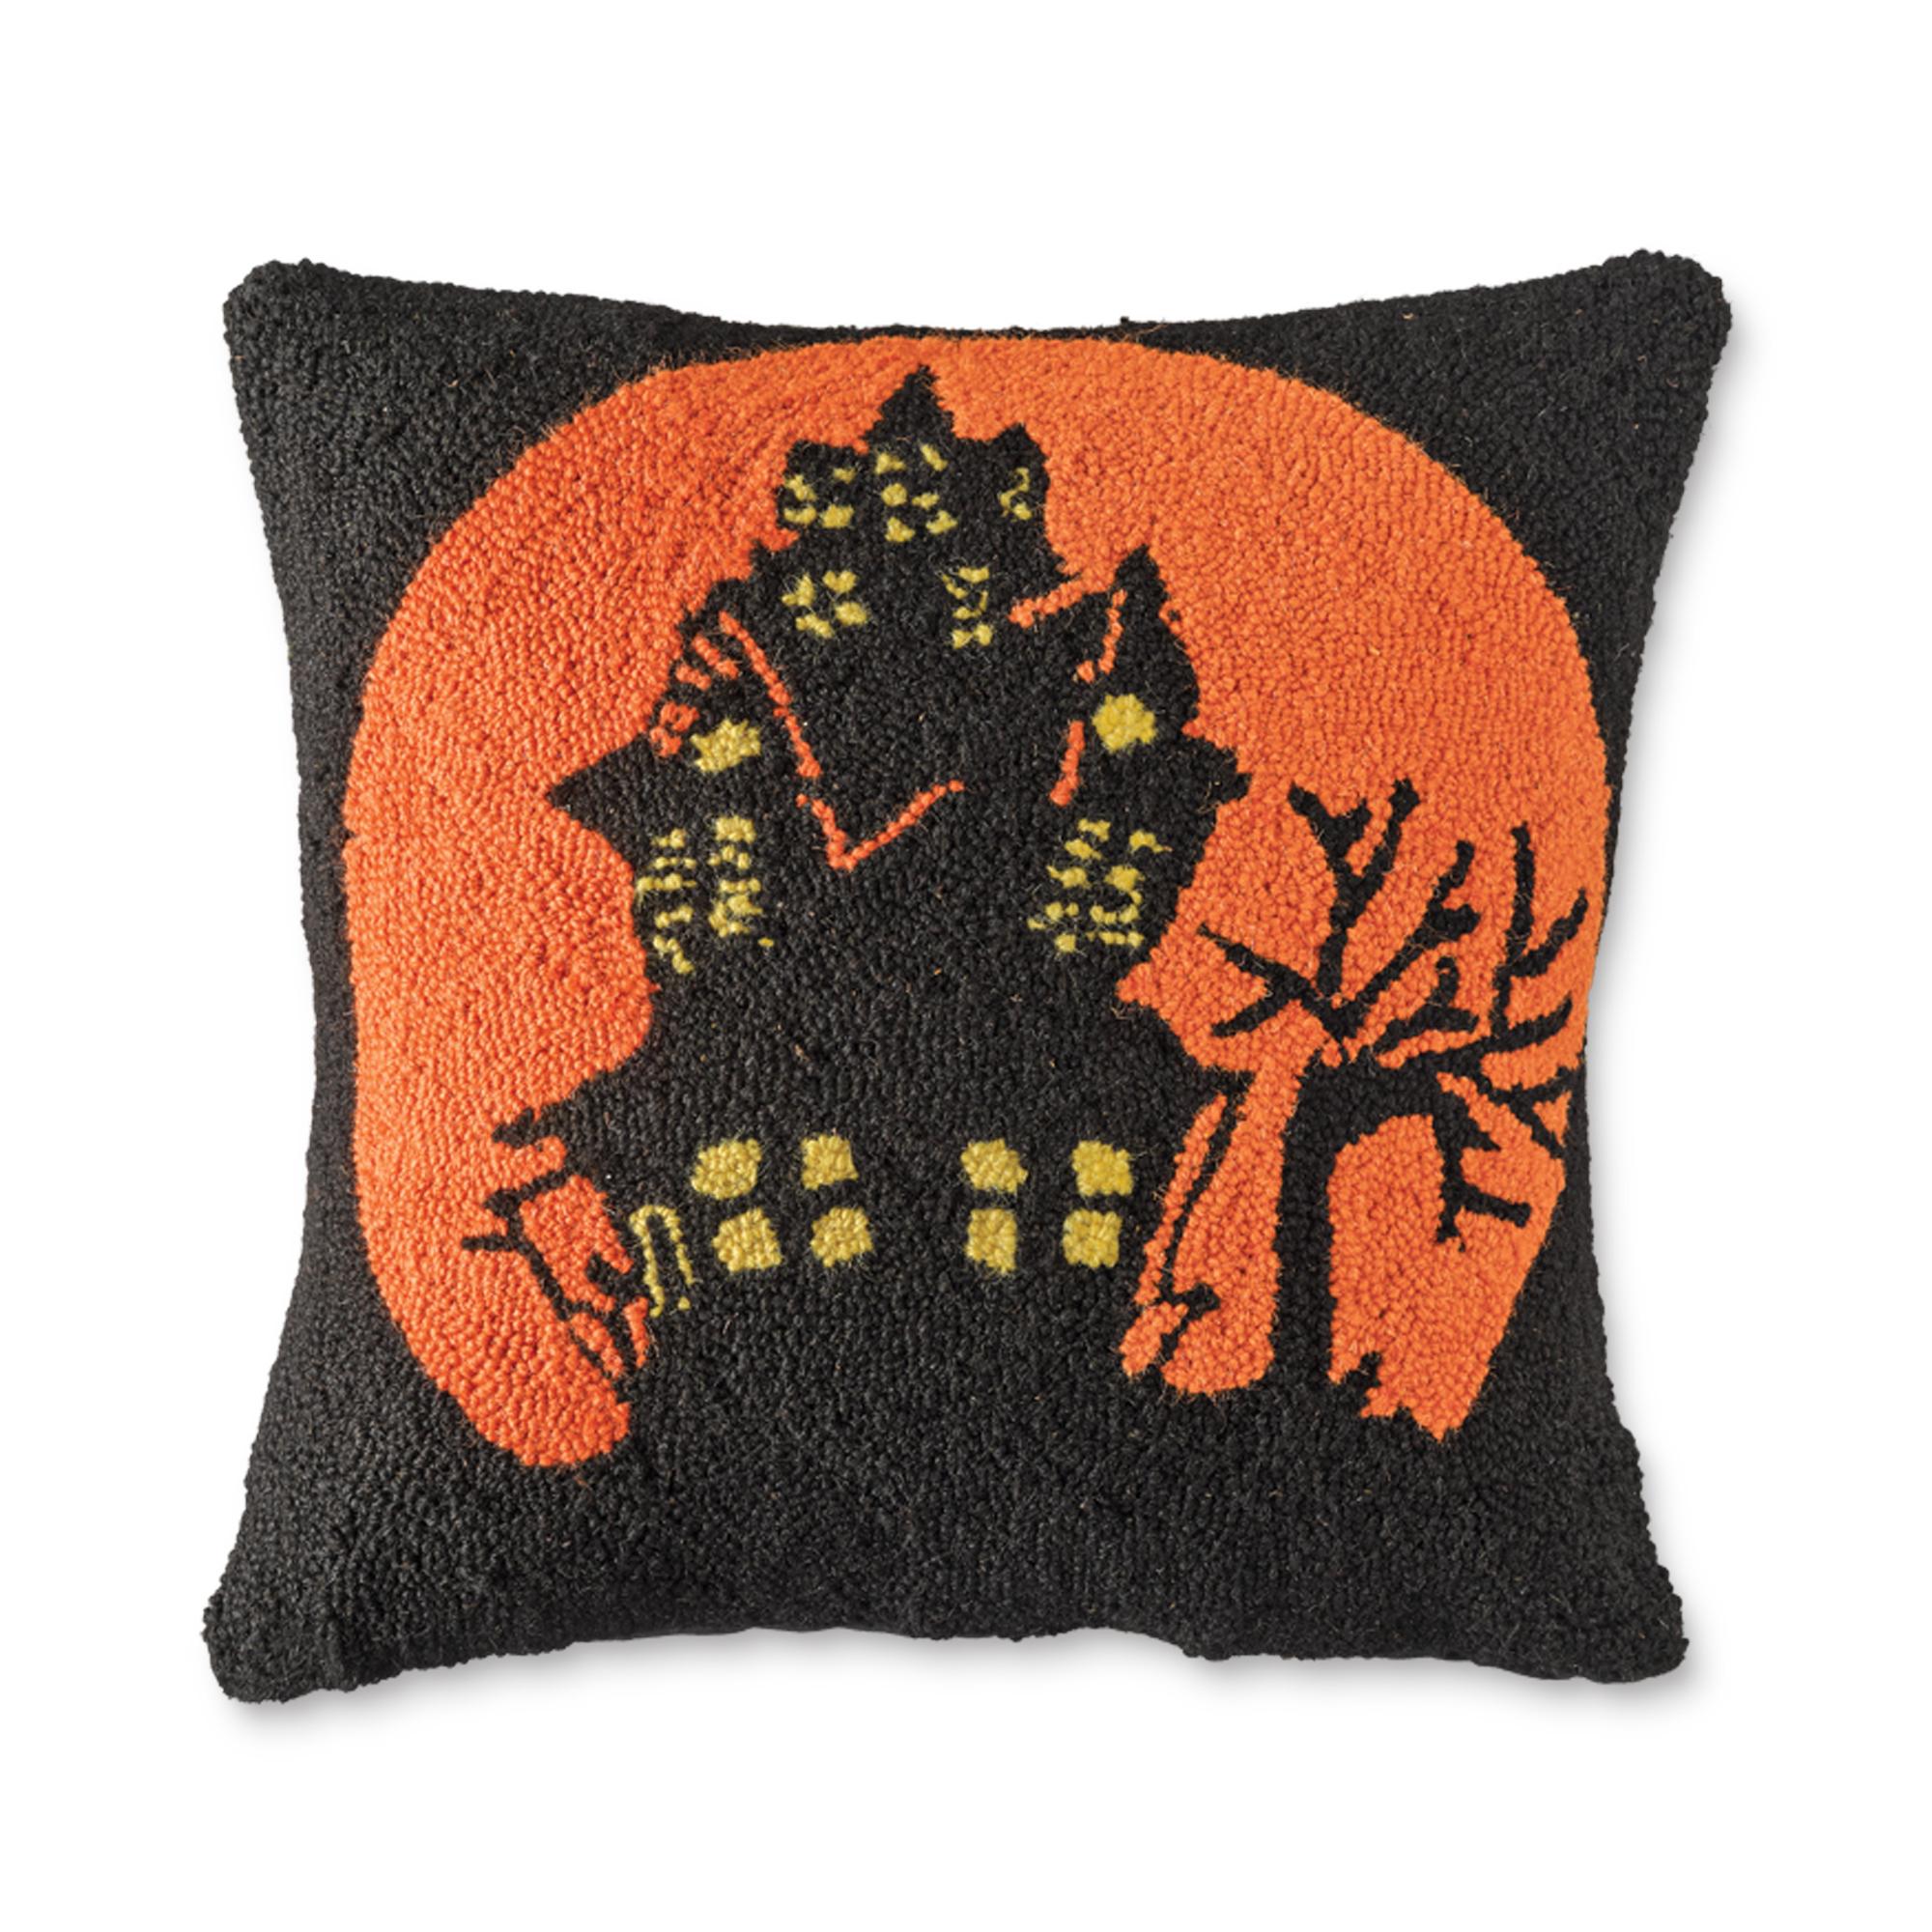 Throw Pillows Home : Haunted House Pillow Gump s